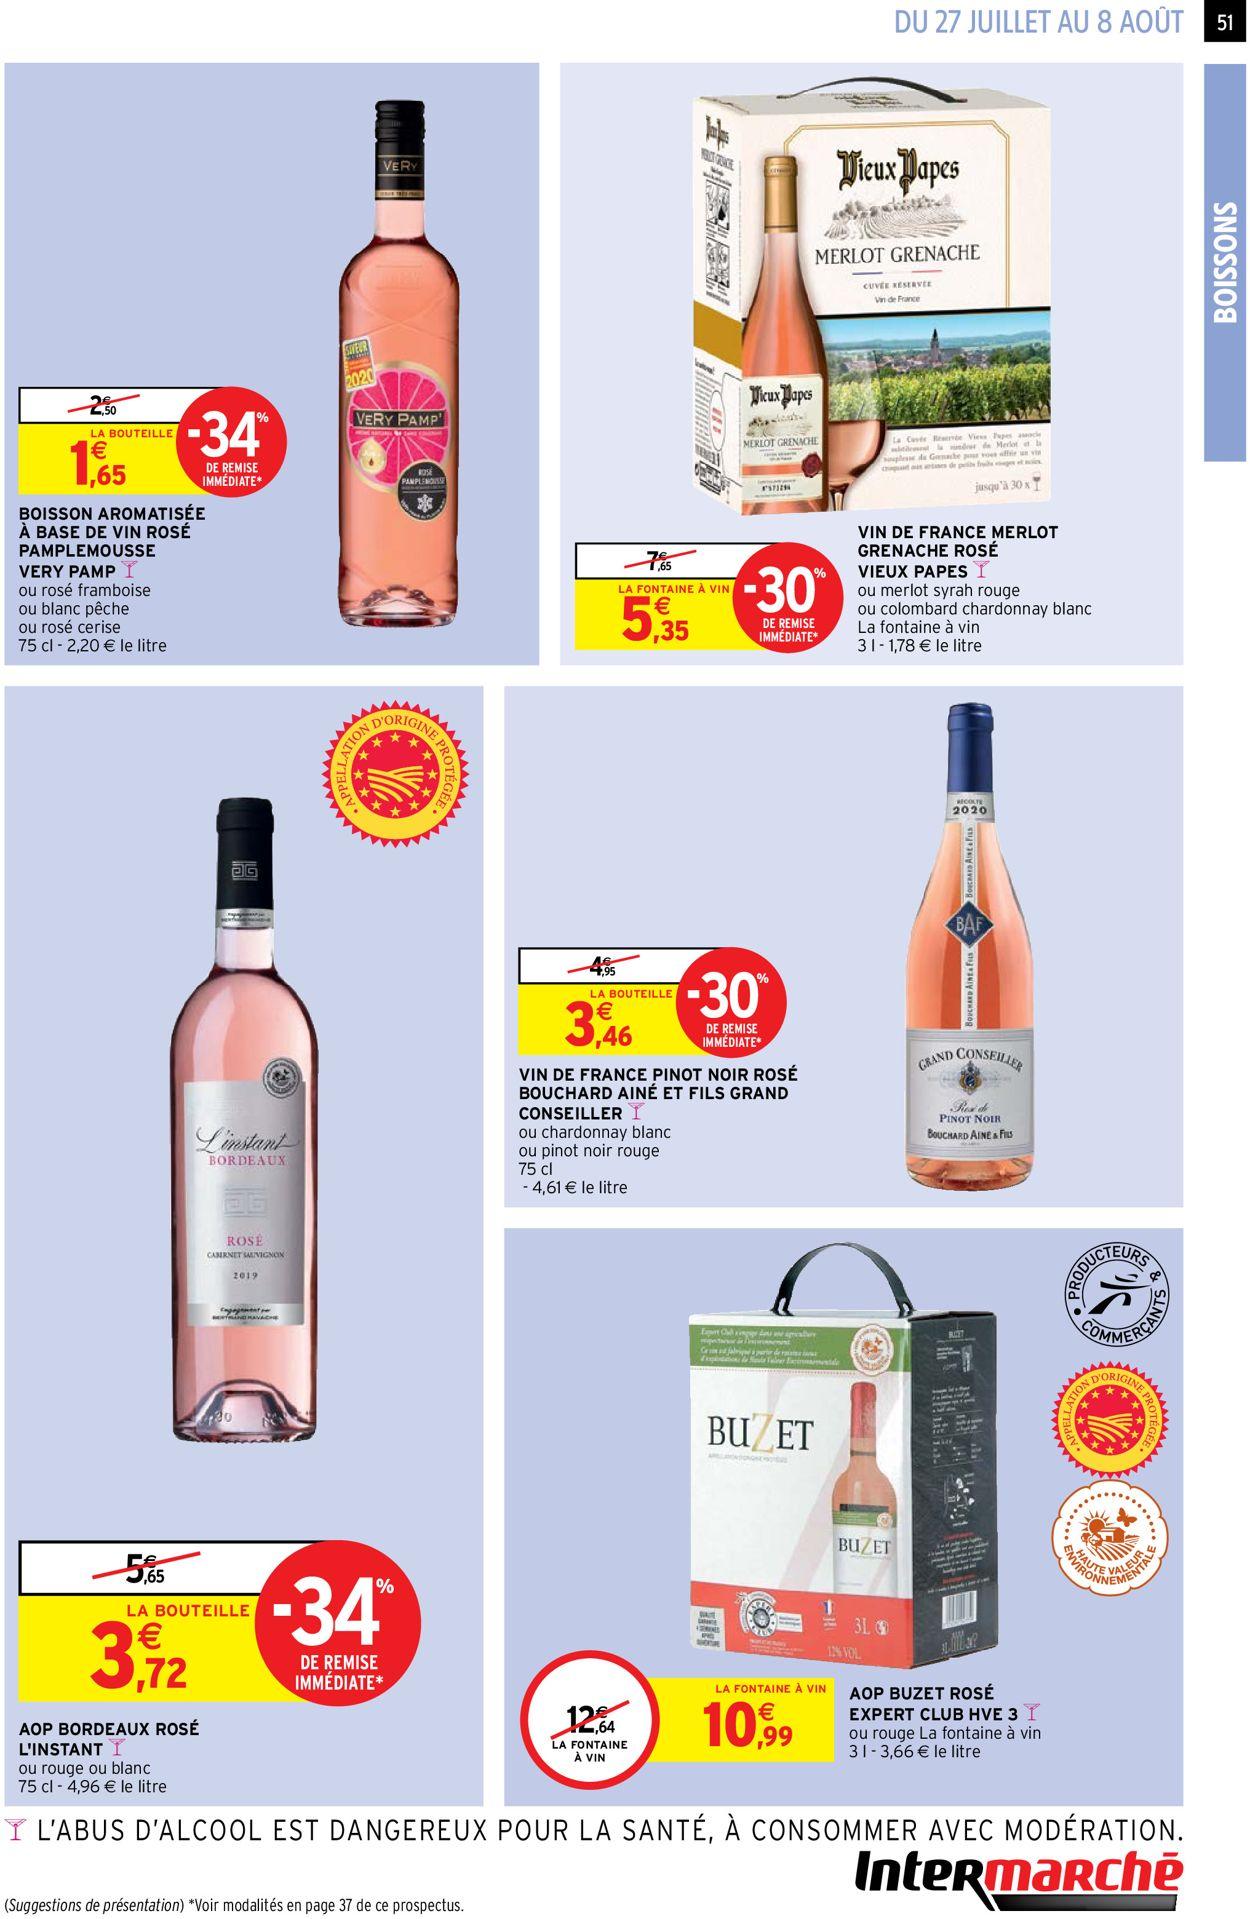 Intermarché Catalogue - 27.07-08.08.2021 (Page 51)